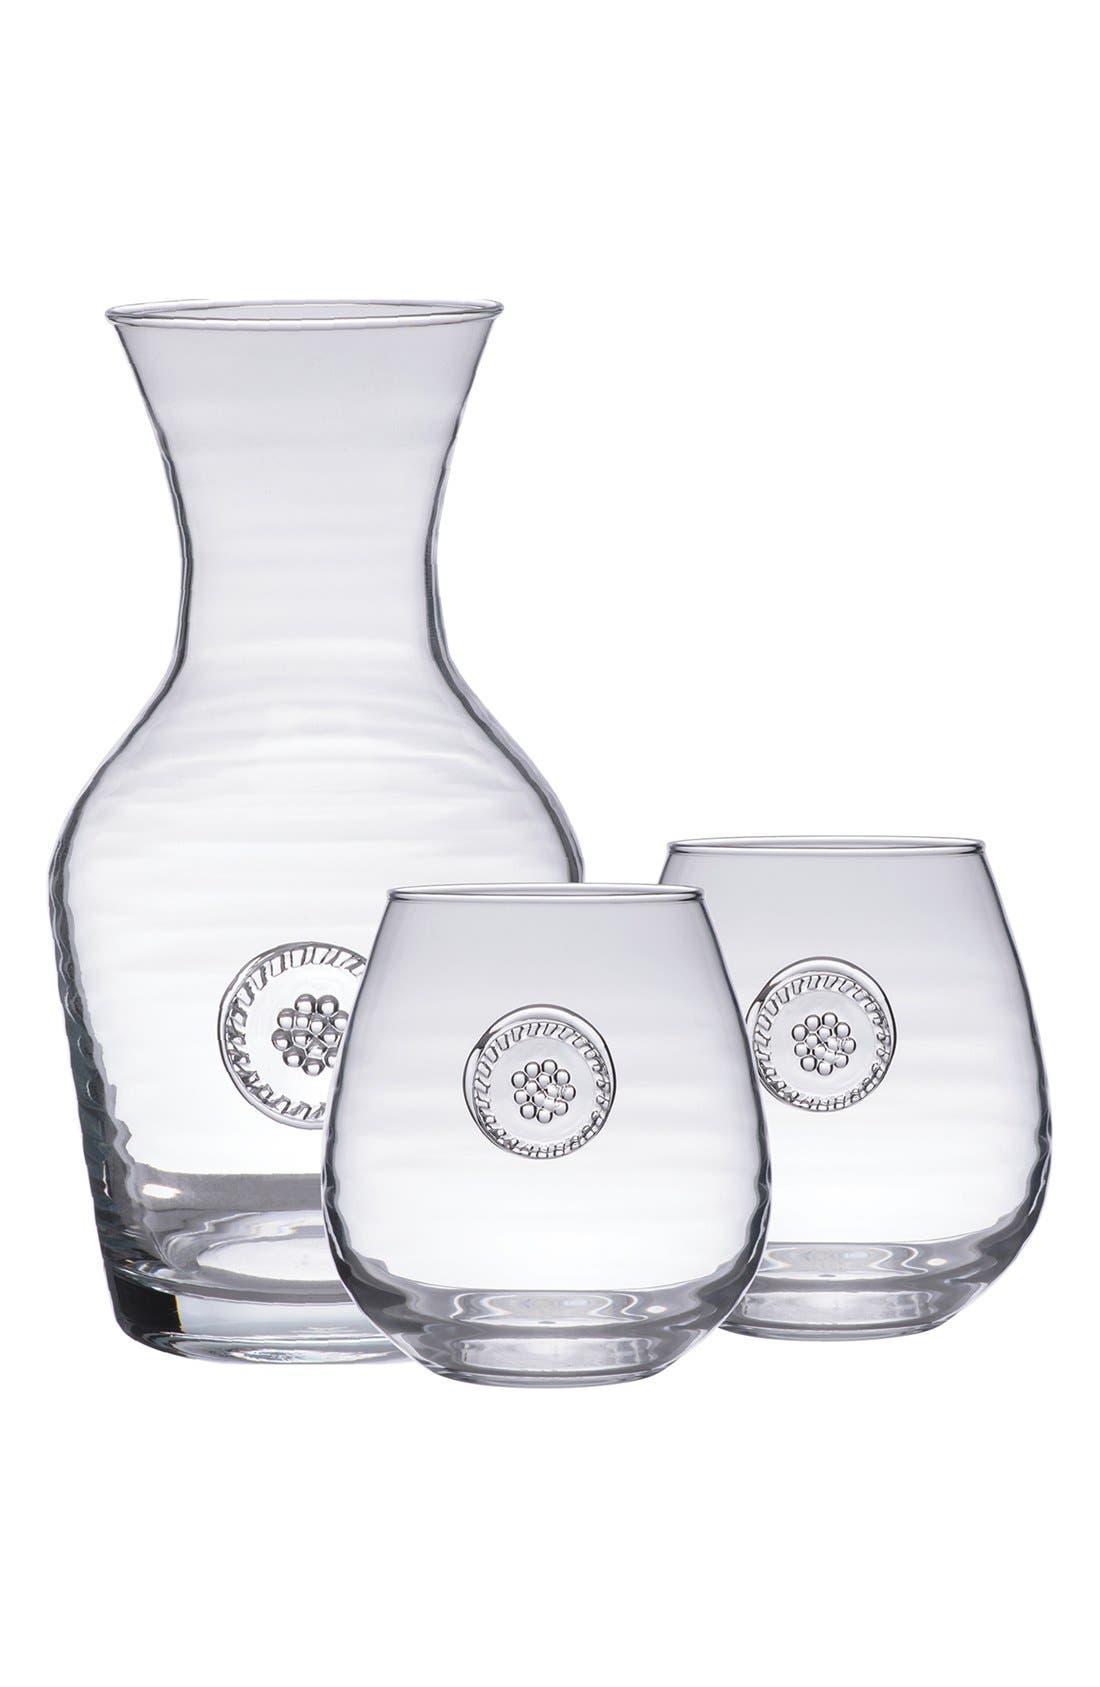 JULISKA 'Berry and Thread' Carafe & StemlessRed WineGlasses